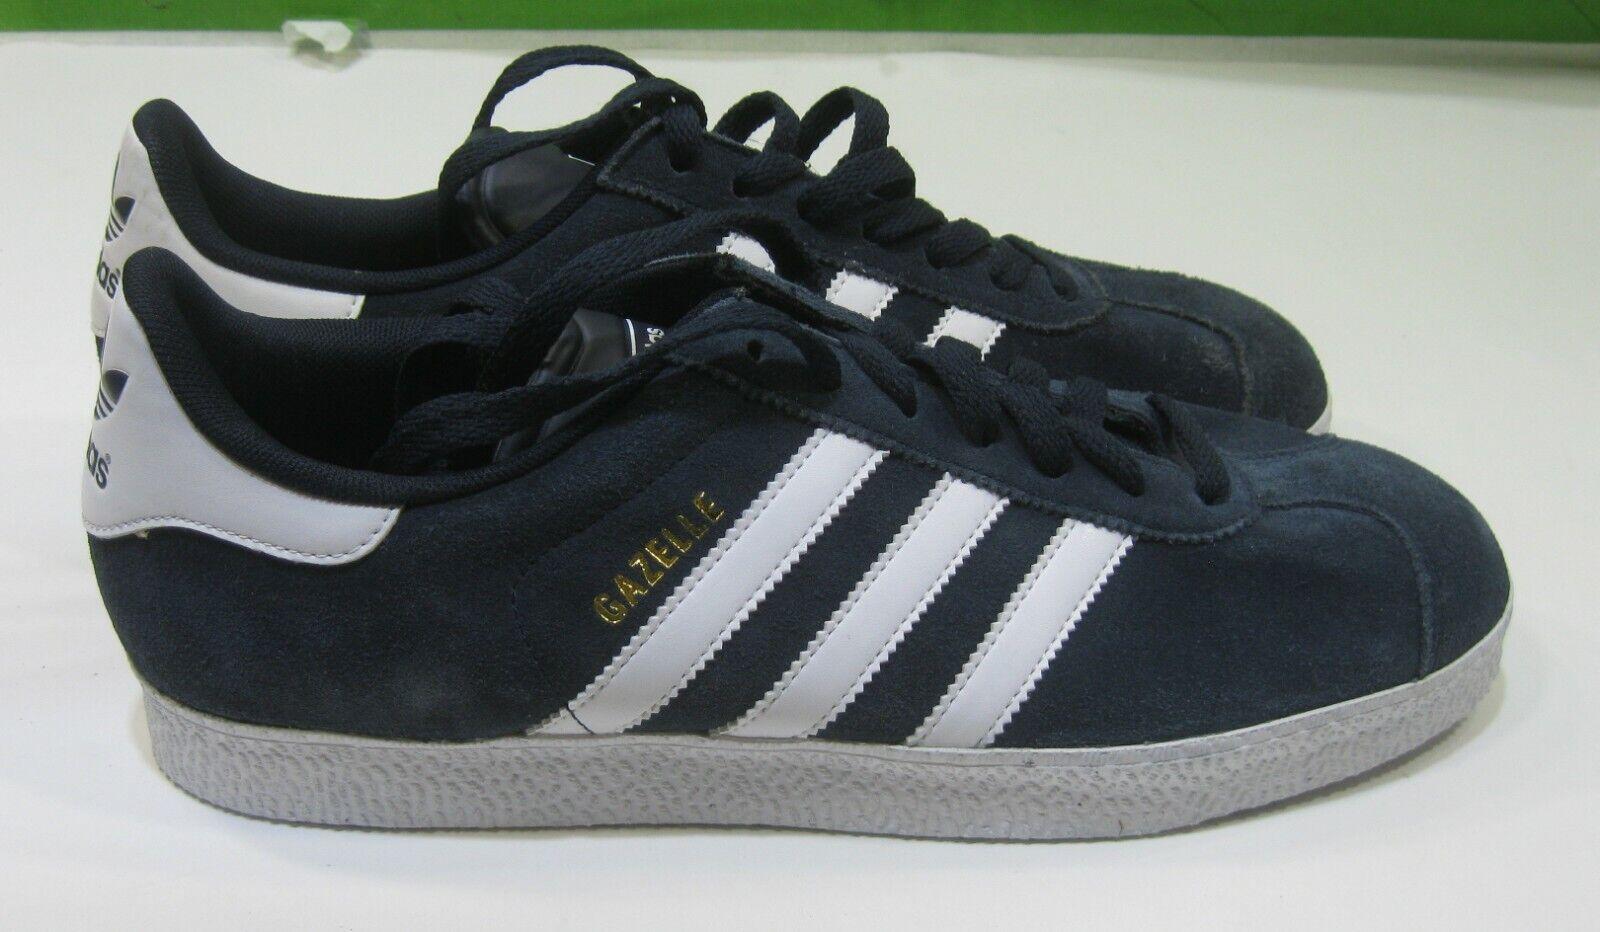 Adidas Men's Originals Gazelle II Casual   shoes Q23101 Size 10-10.5